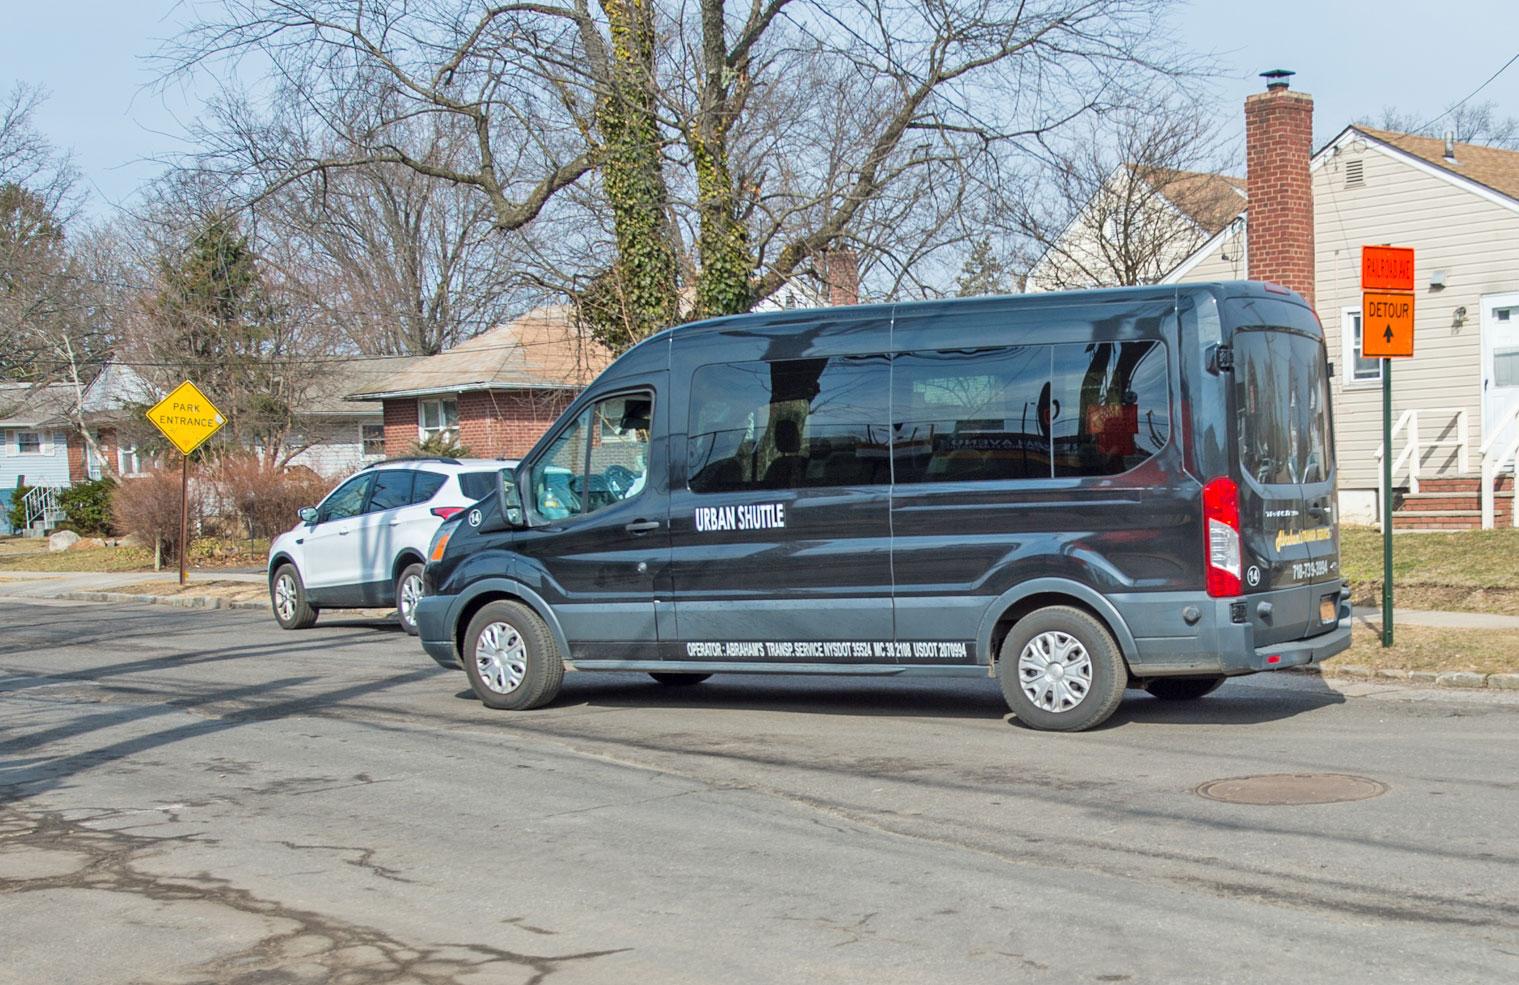 Urban Avenue Shuttle 03-29-19